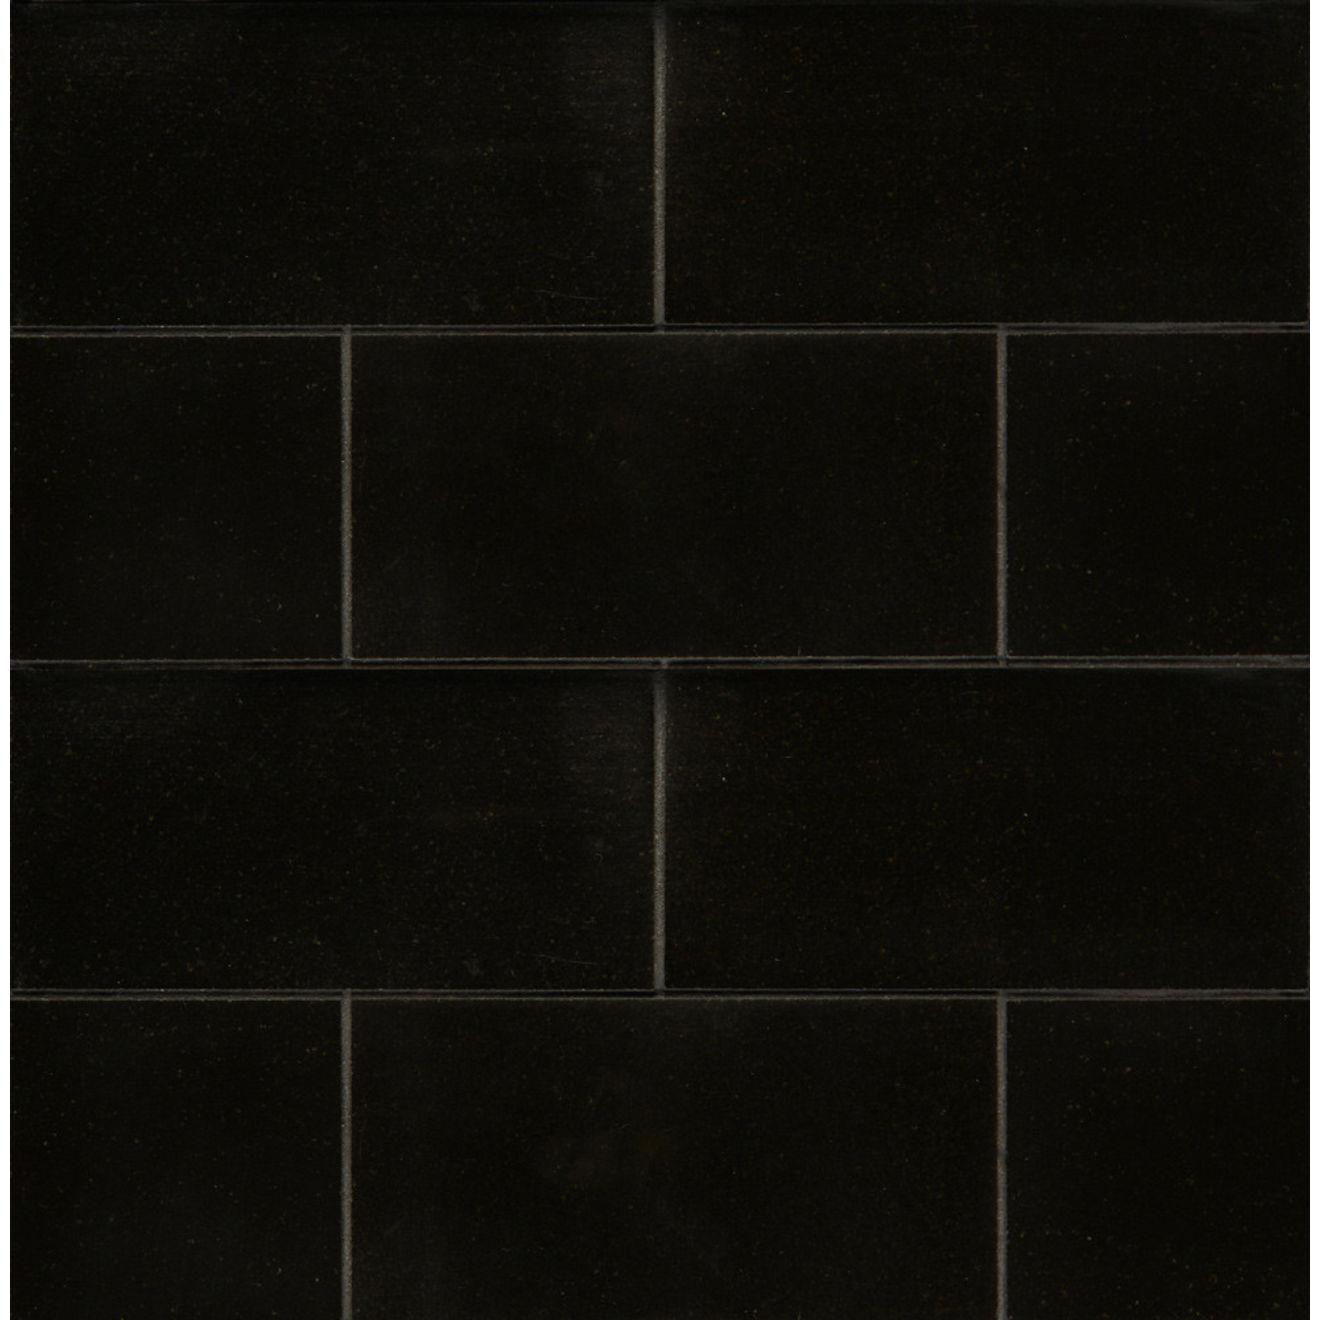 "Absolute Black 3"" x 6"" Floor & Wall Tile"